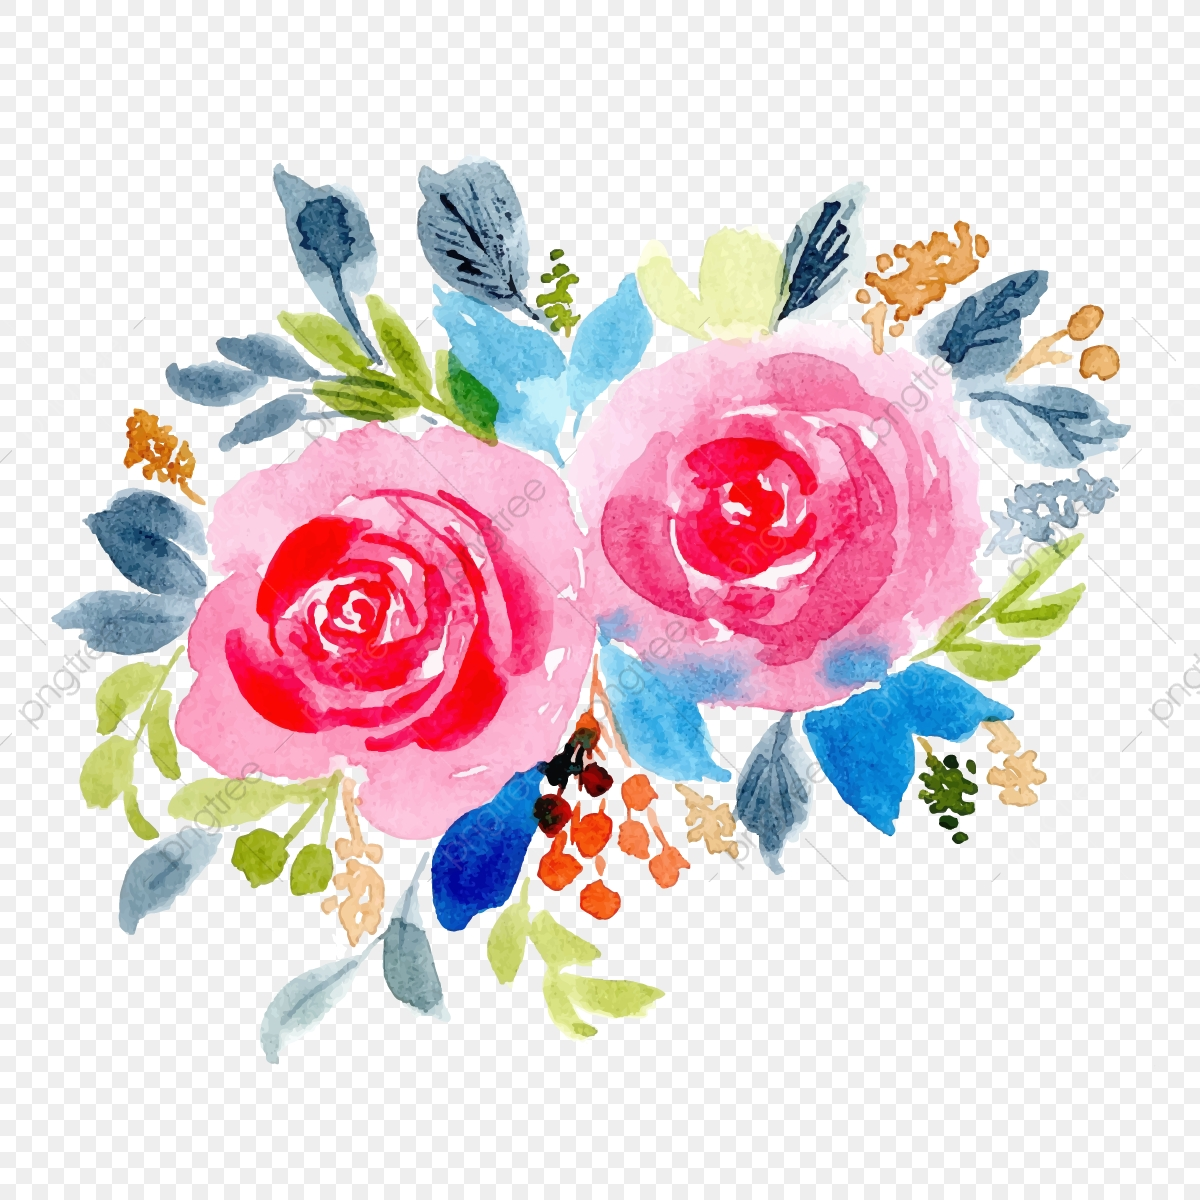 Pink Blue Floral Watercolor Background Floral Flower Leaves Png